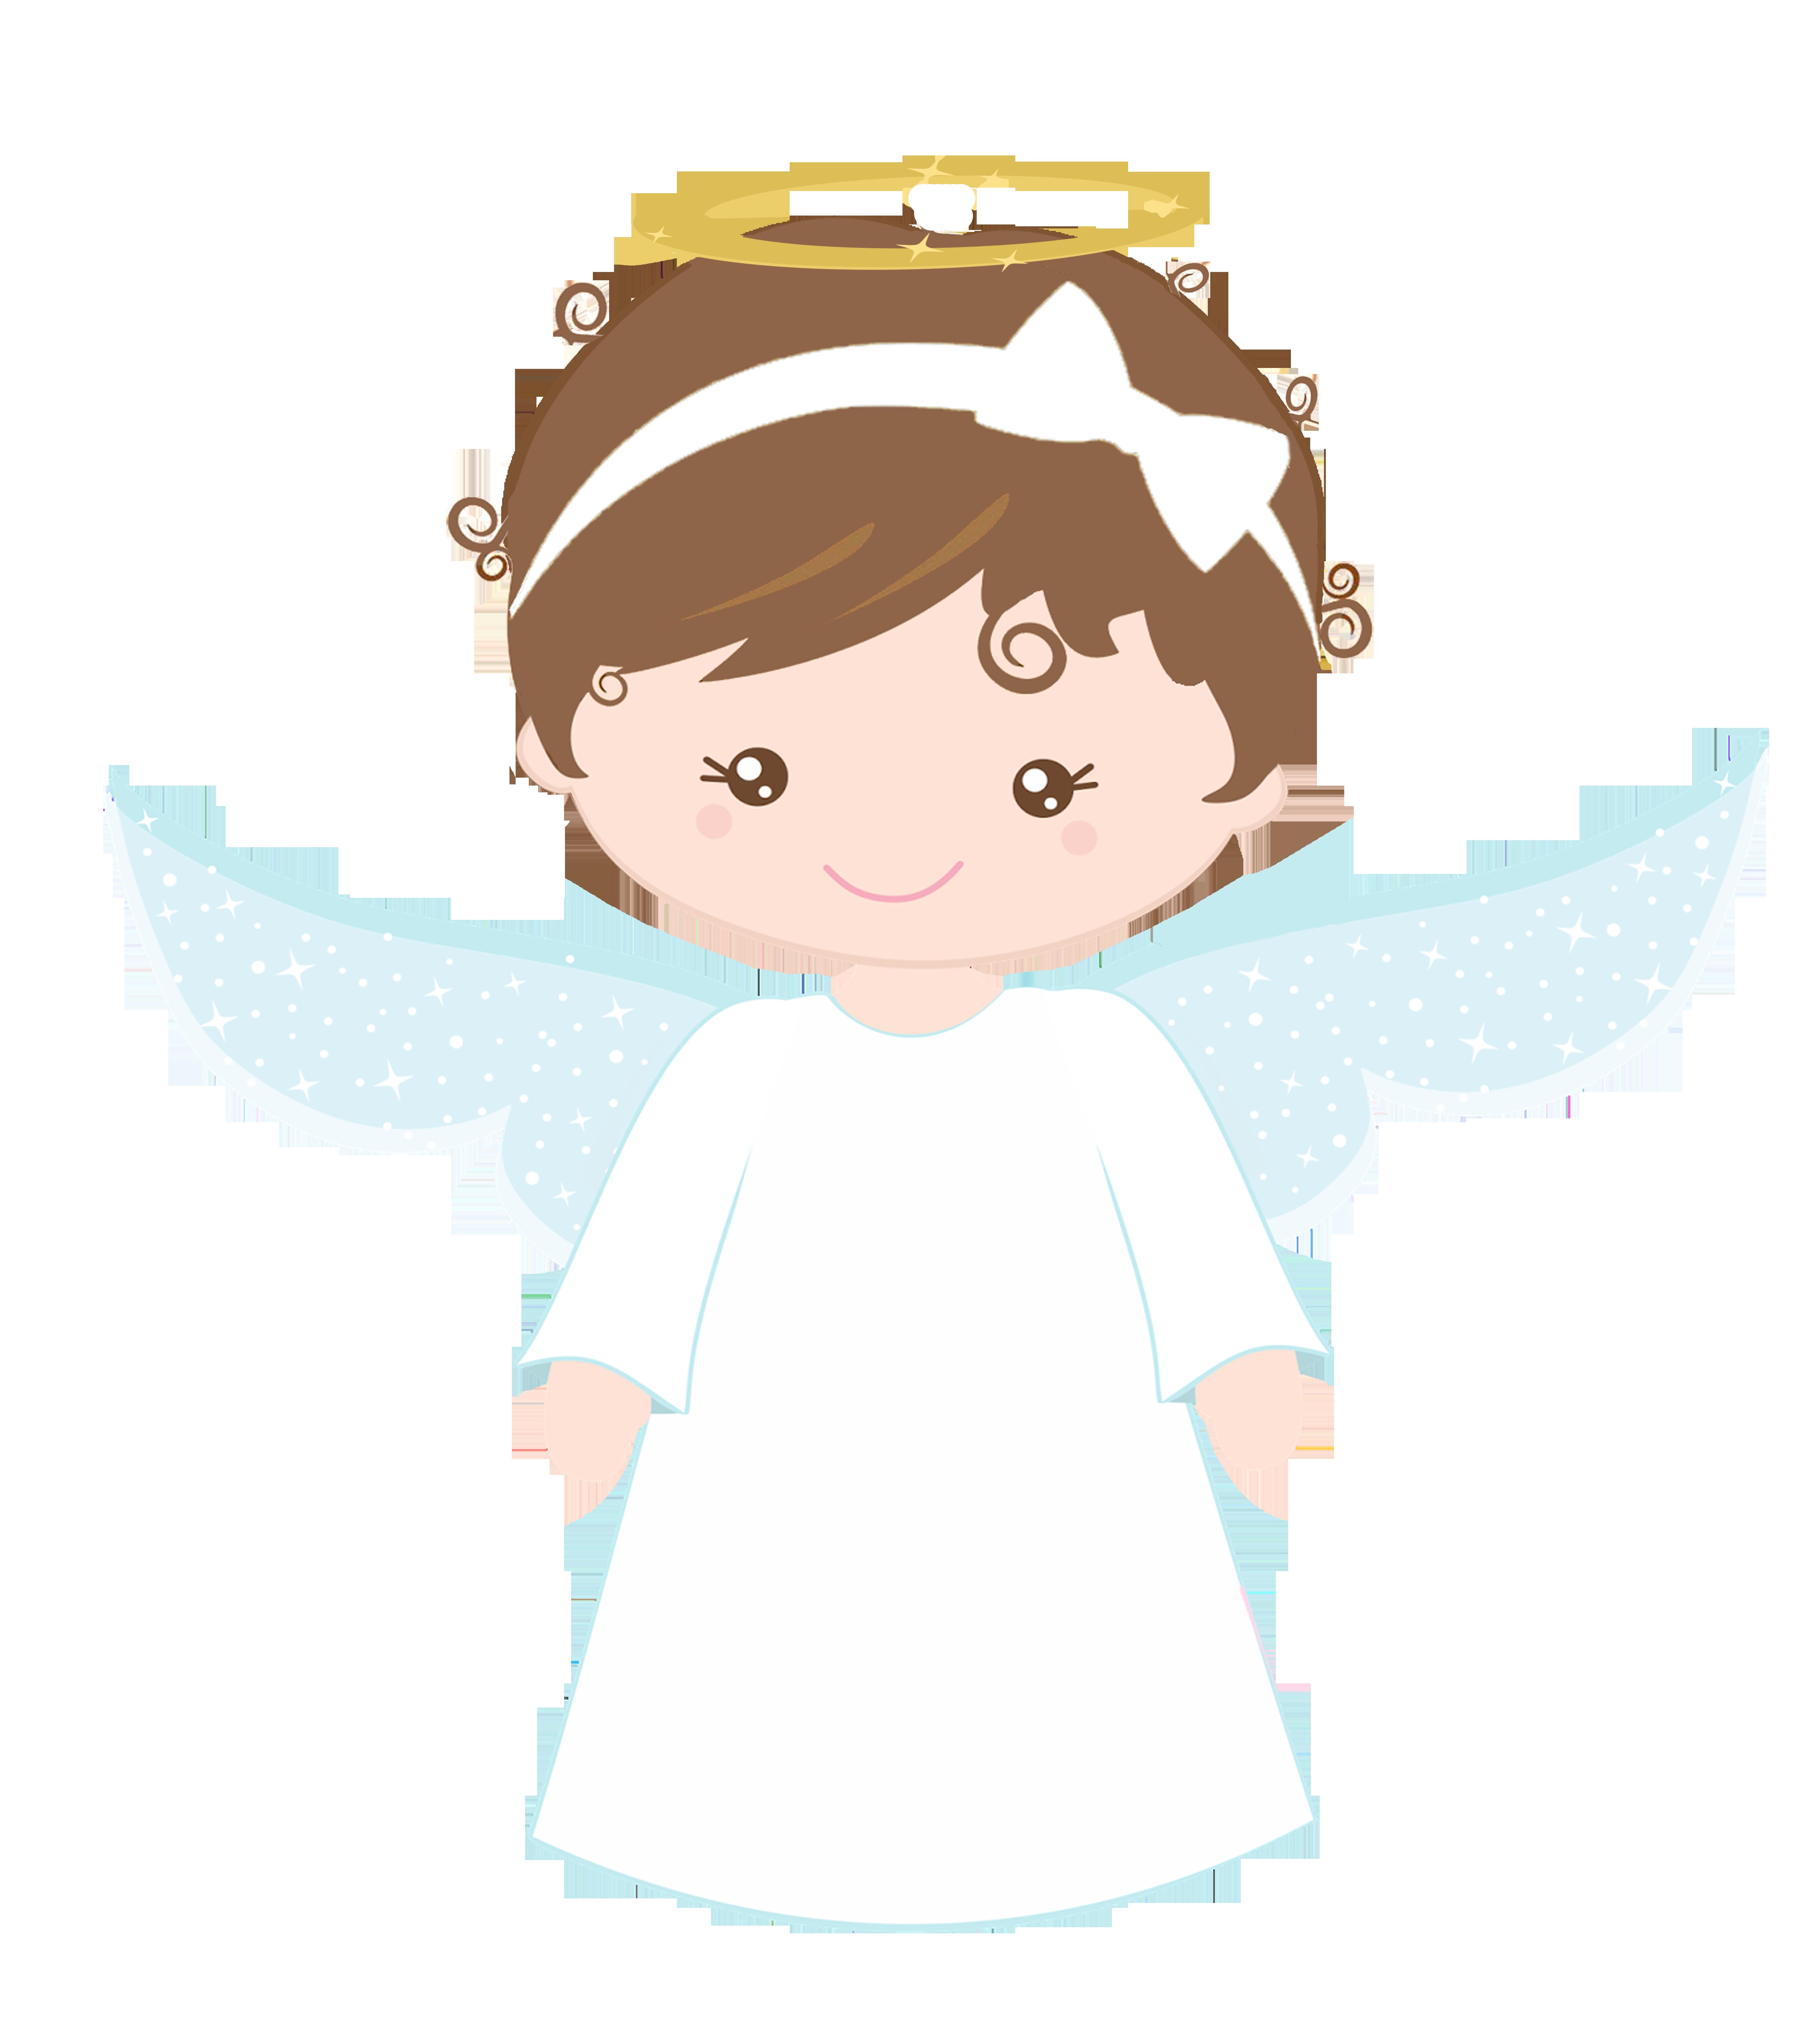 Ангелочки для крестин картинки, рисунки